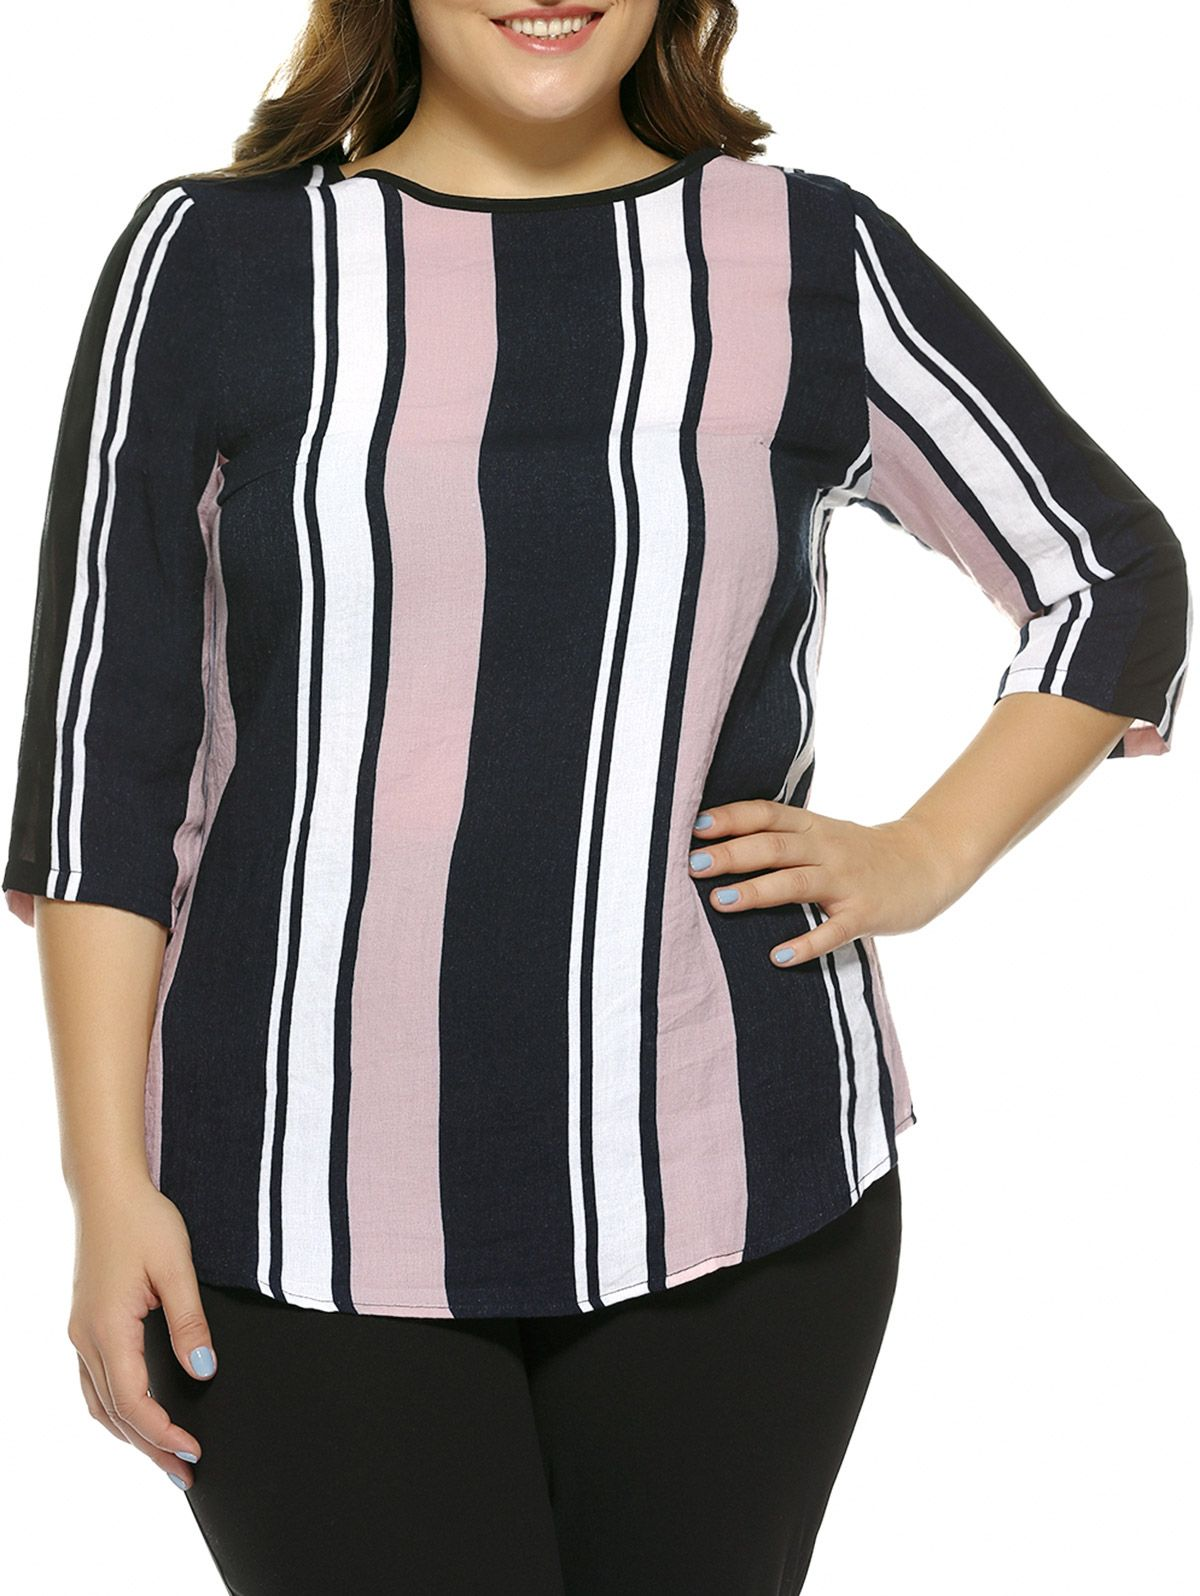 NEXTMIA - Oversized Elegant Color Block Stripe Blouse